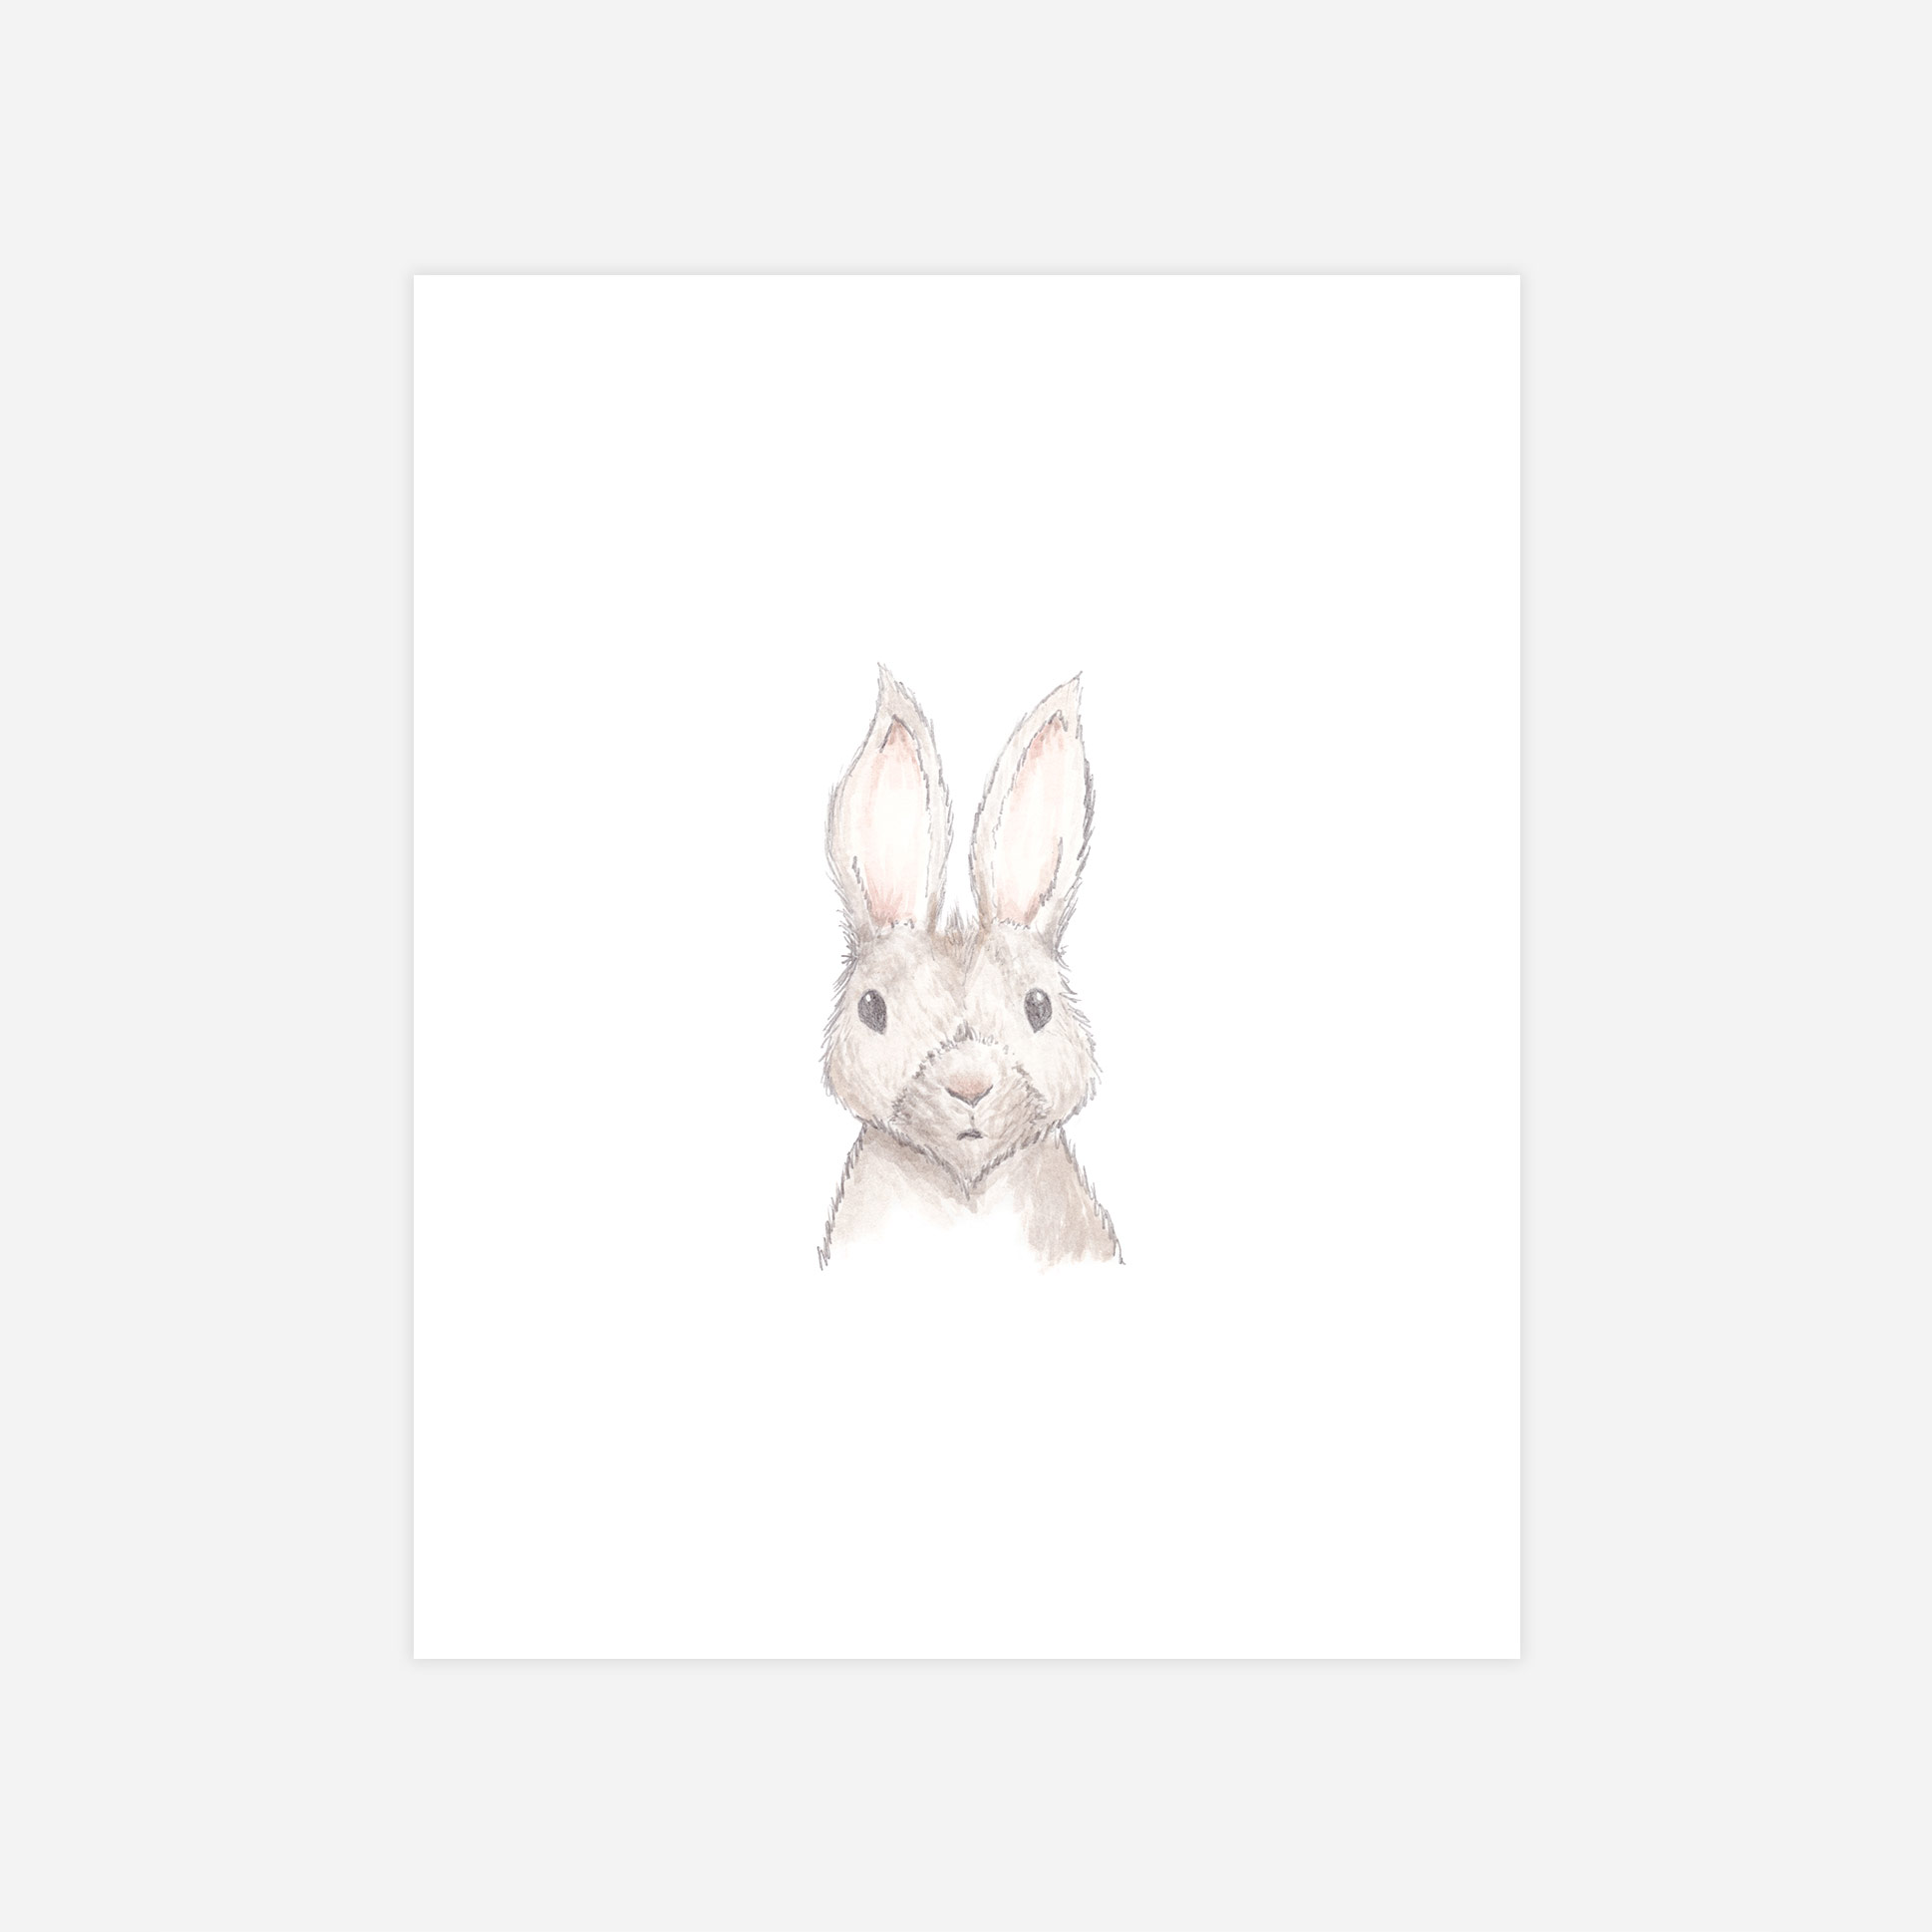 coeo-print-company-free-bunny-nursery-art-print-download-printable-baby-8.jpg